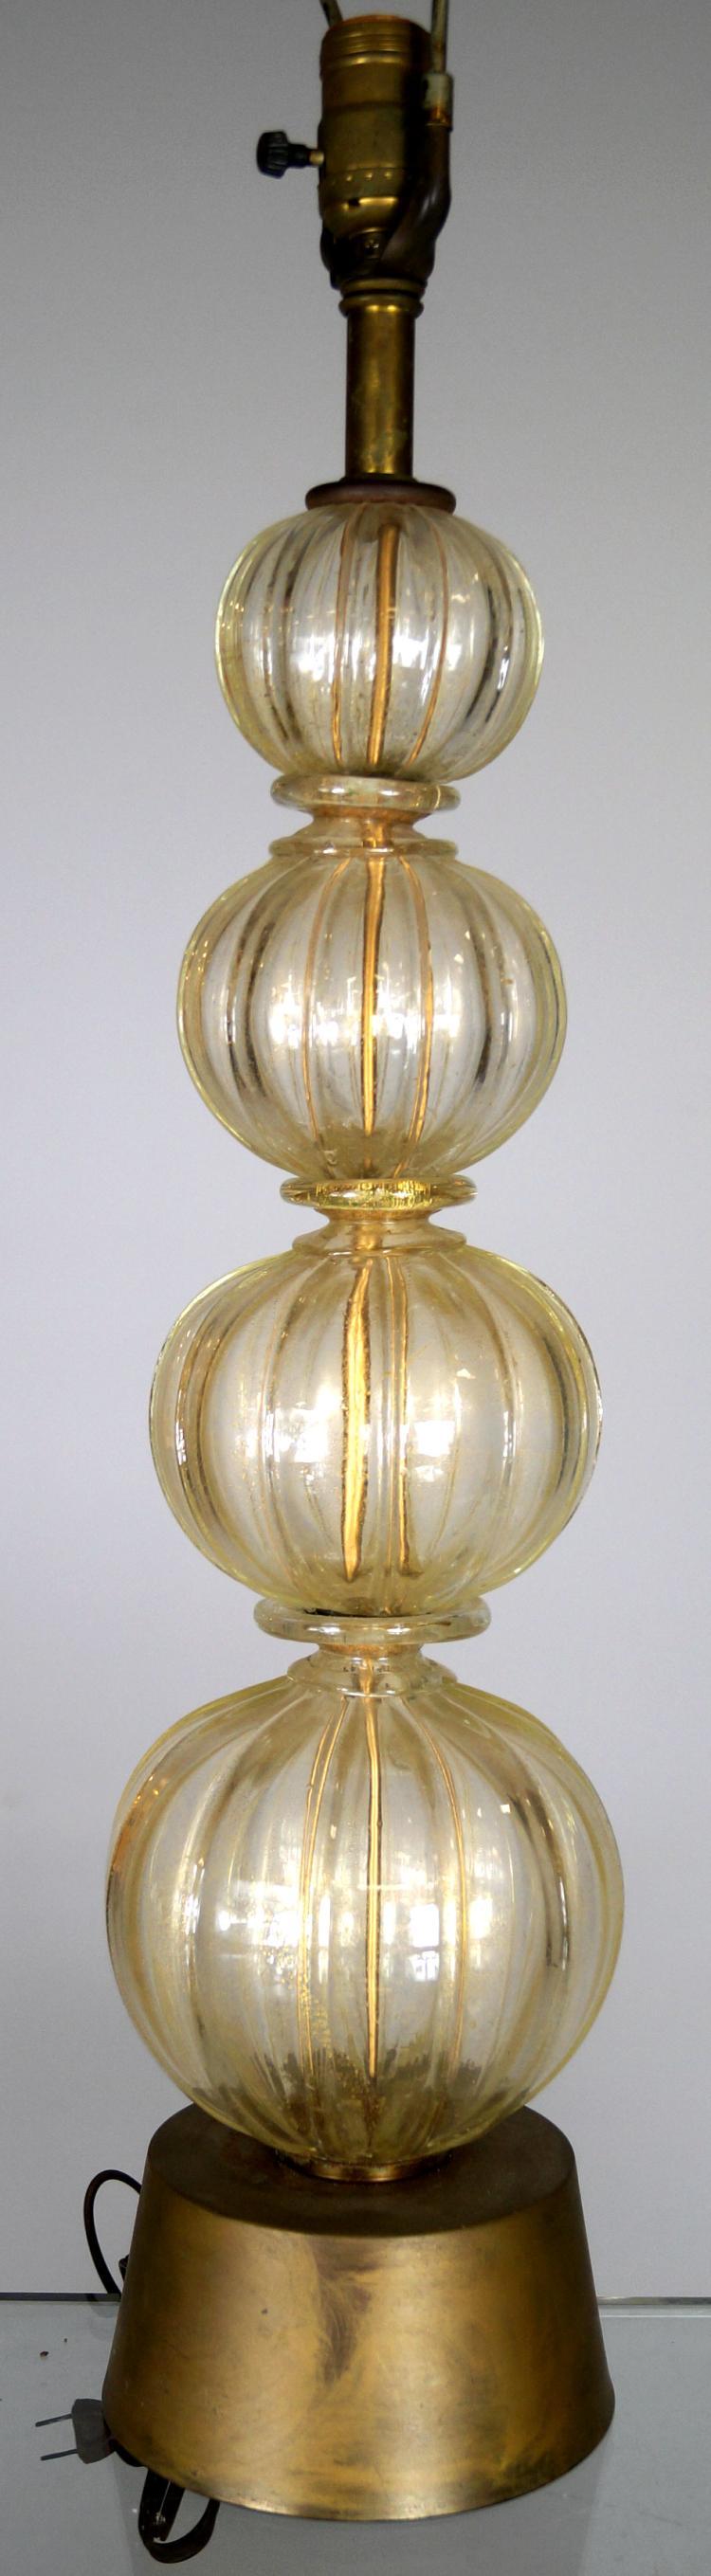 MID-CENTURY VENETIAN GLASS TABLE LAMP. HEIGHT 22